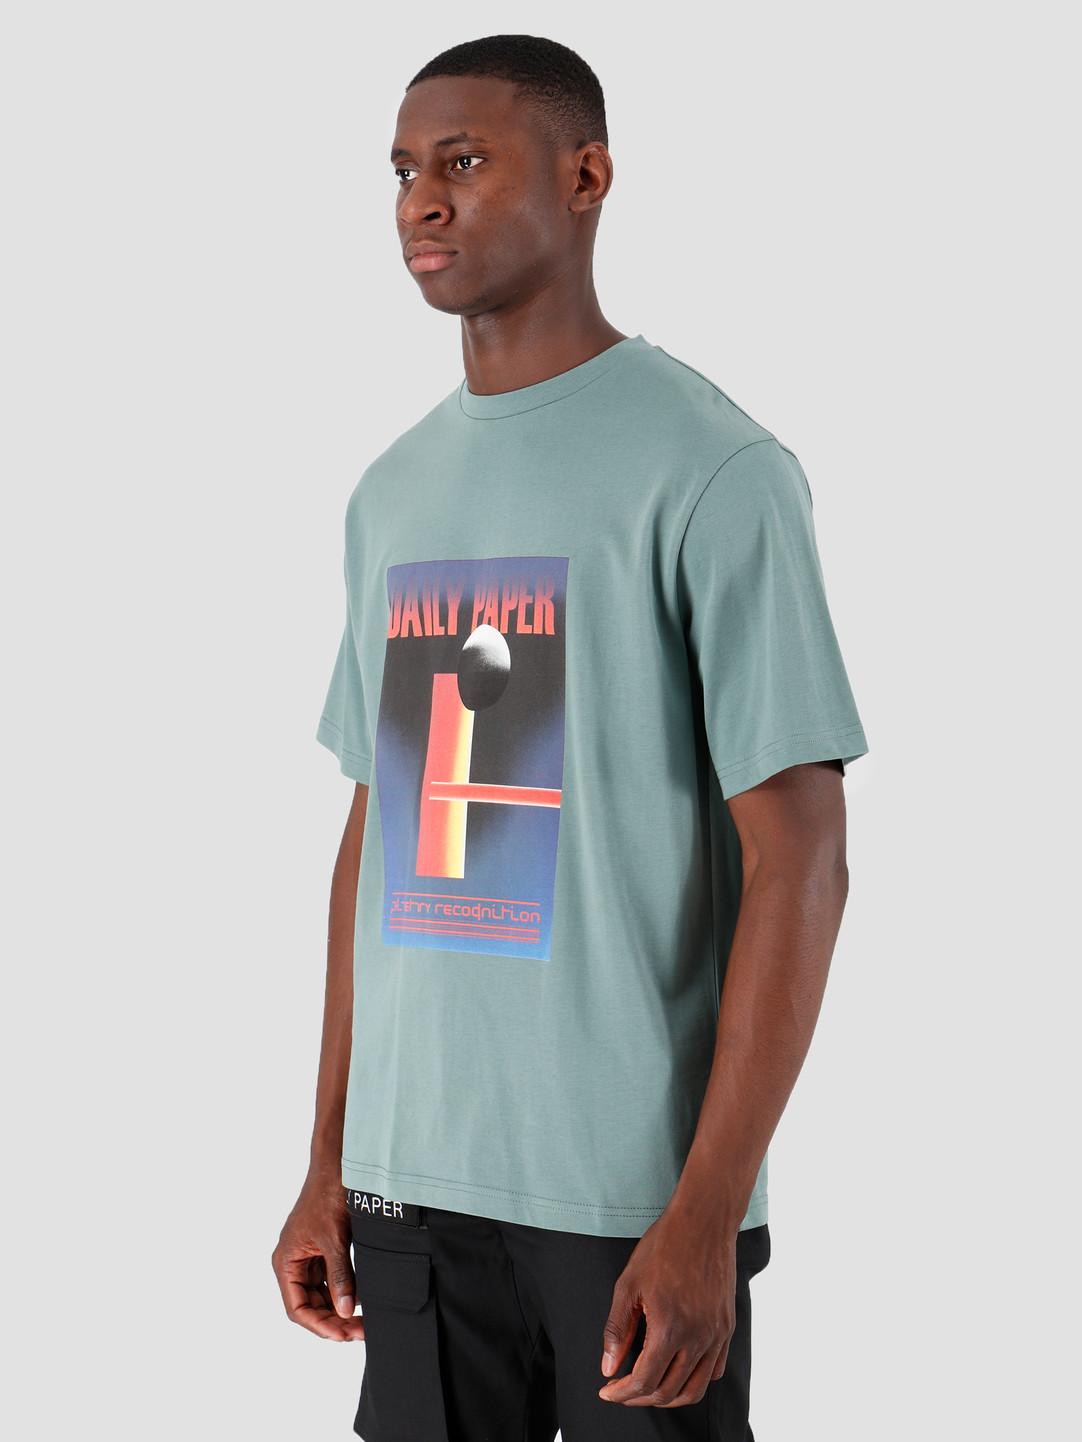 Daily Paper Daily Paper Genbris T-Shirt Bristol Blue 19F1TS14-01